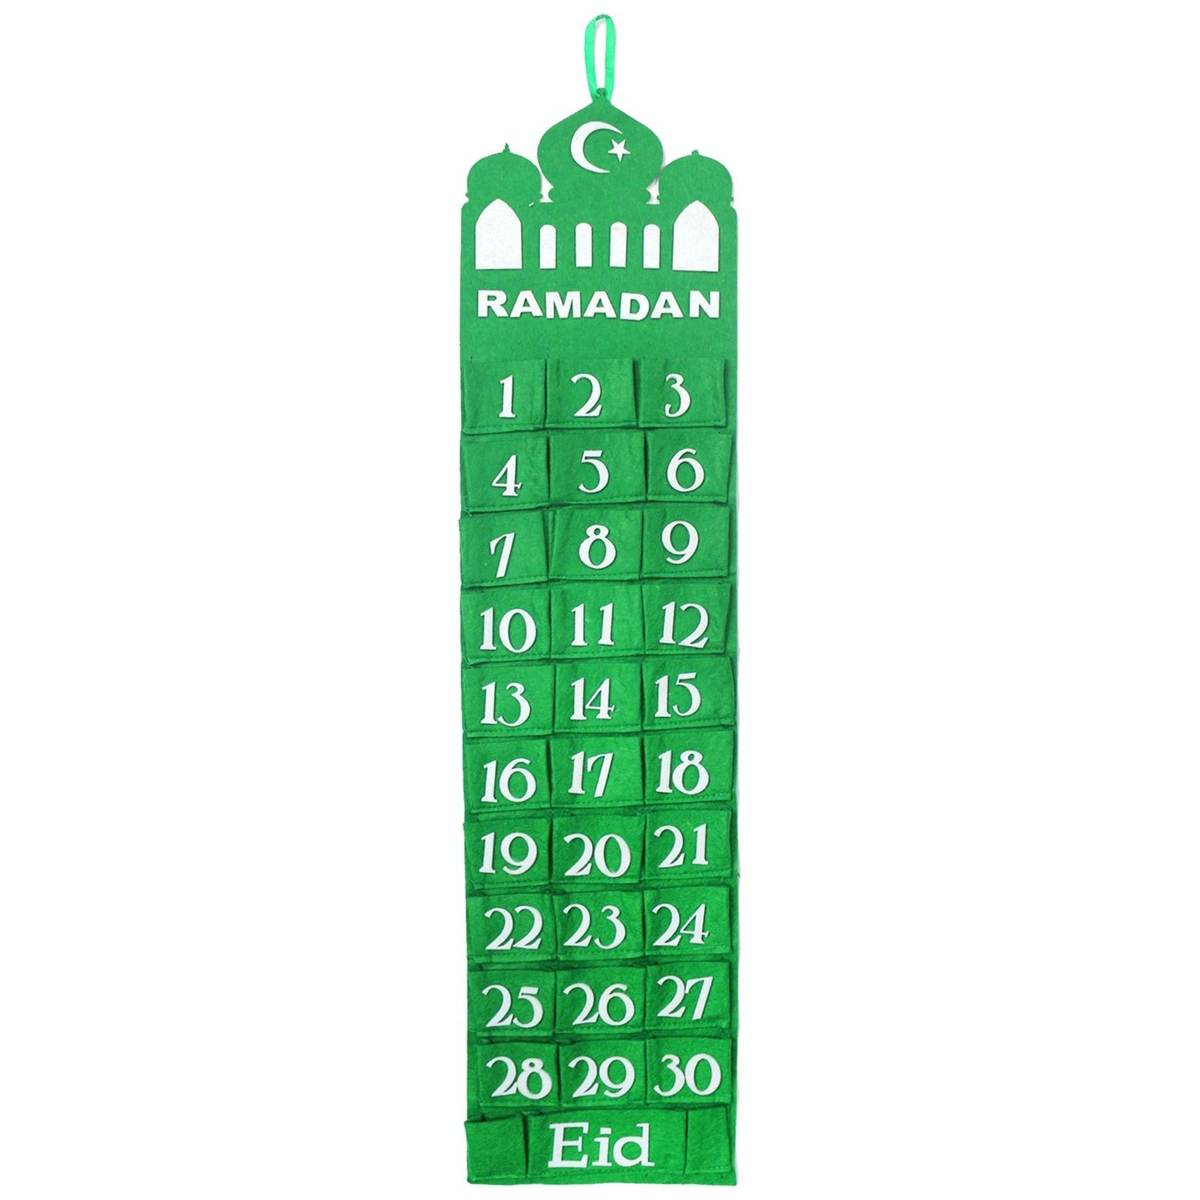 Happy EID Mubarak Decor Ramadan Kareem Calendar Table Runner Blue Black Glitter Gold Muslim Party EID Ramadan Festival Present